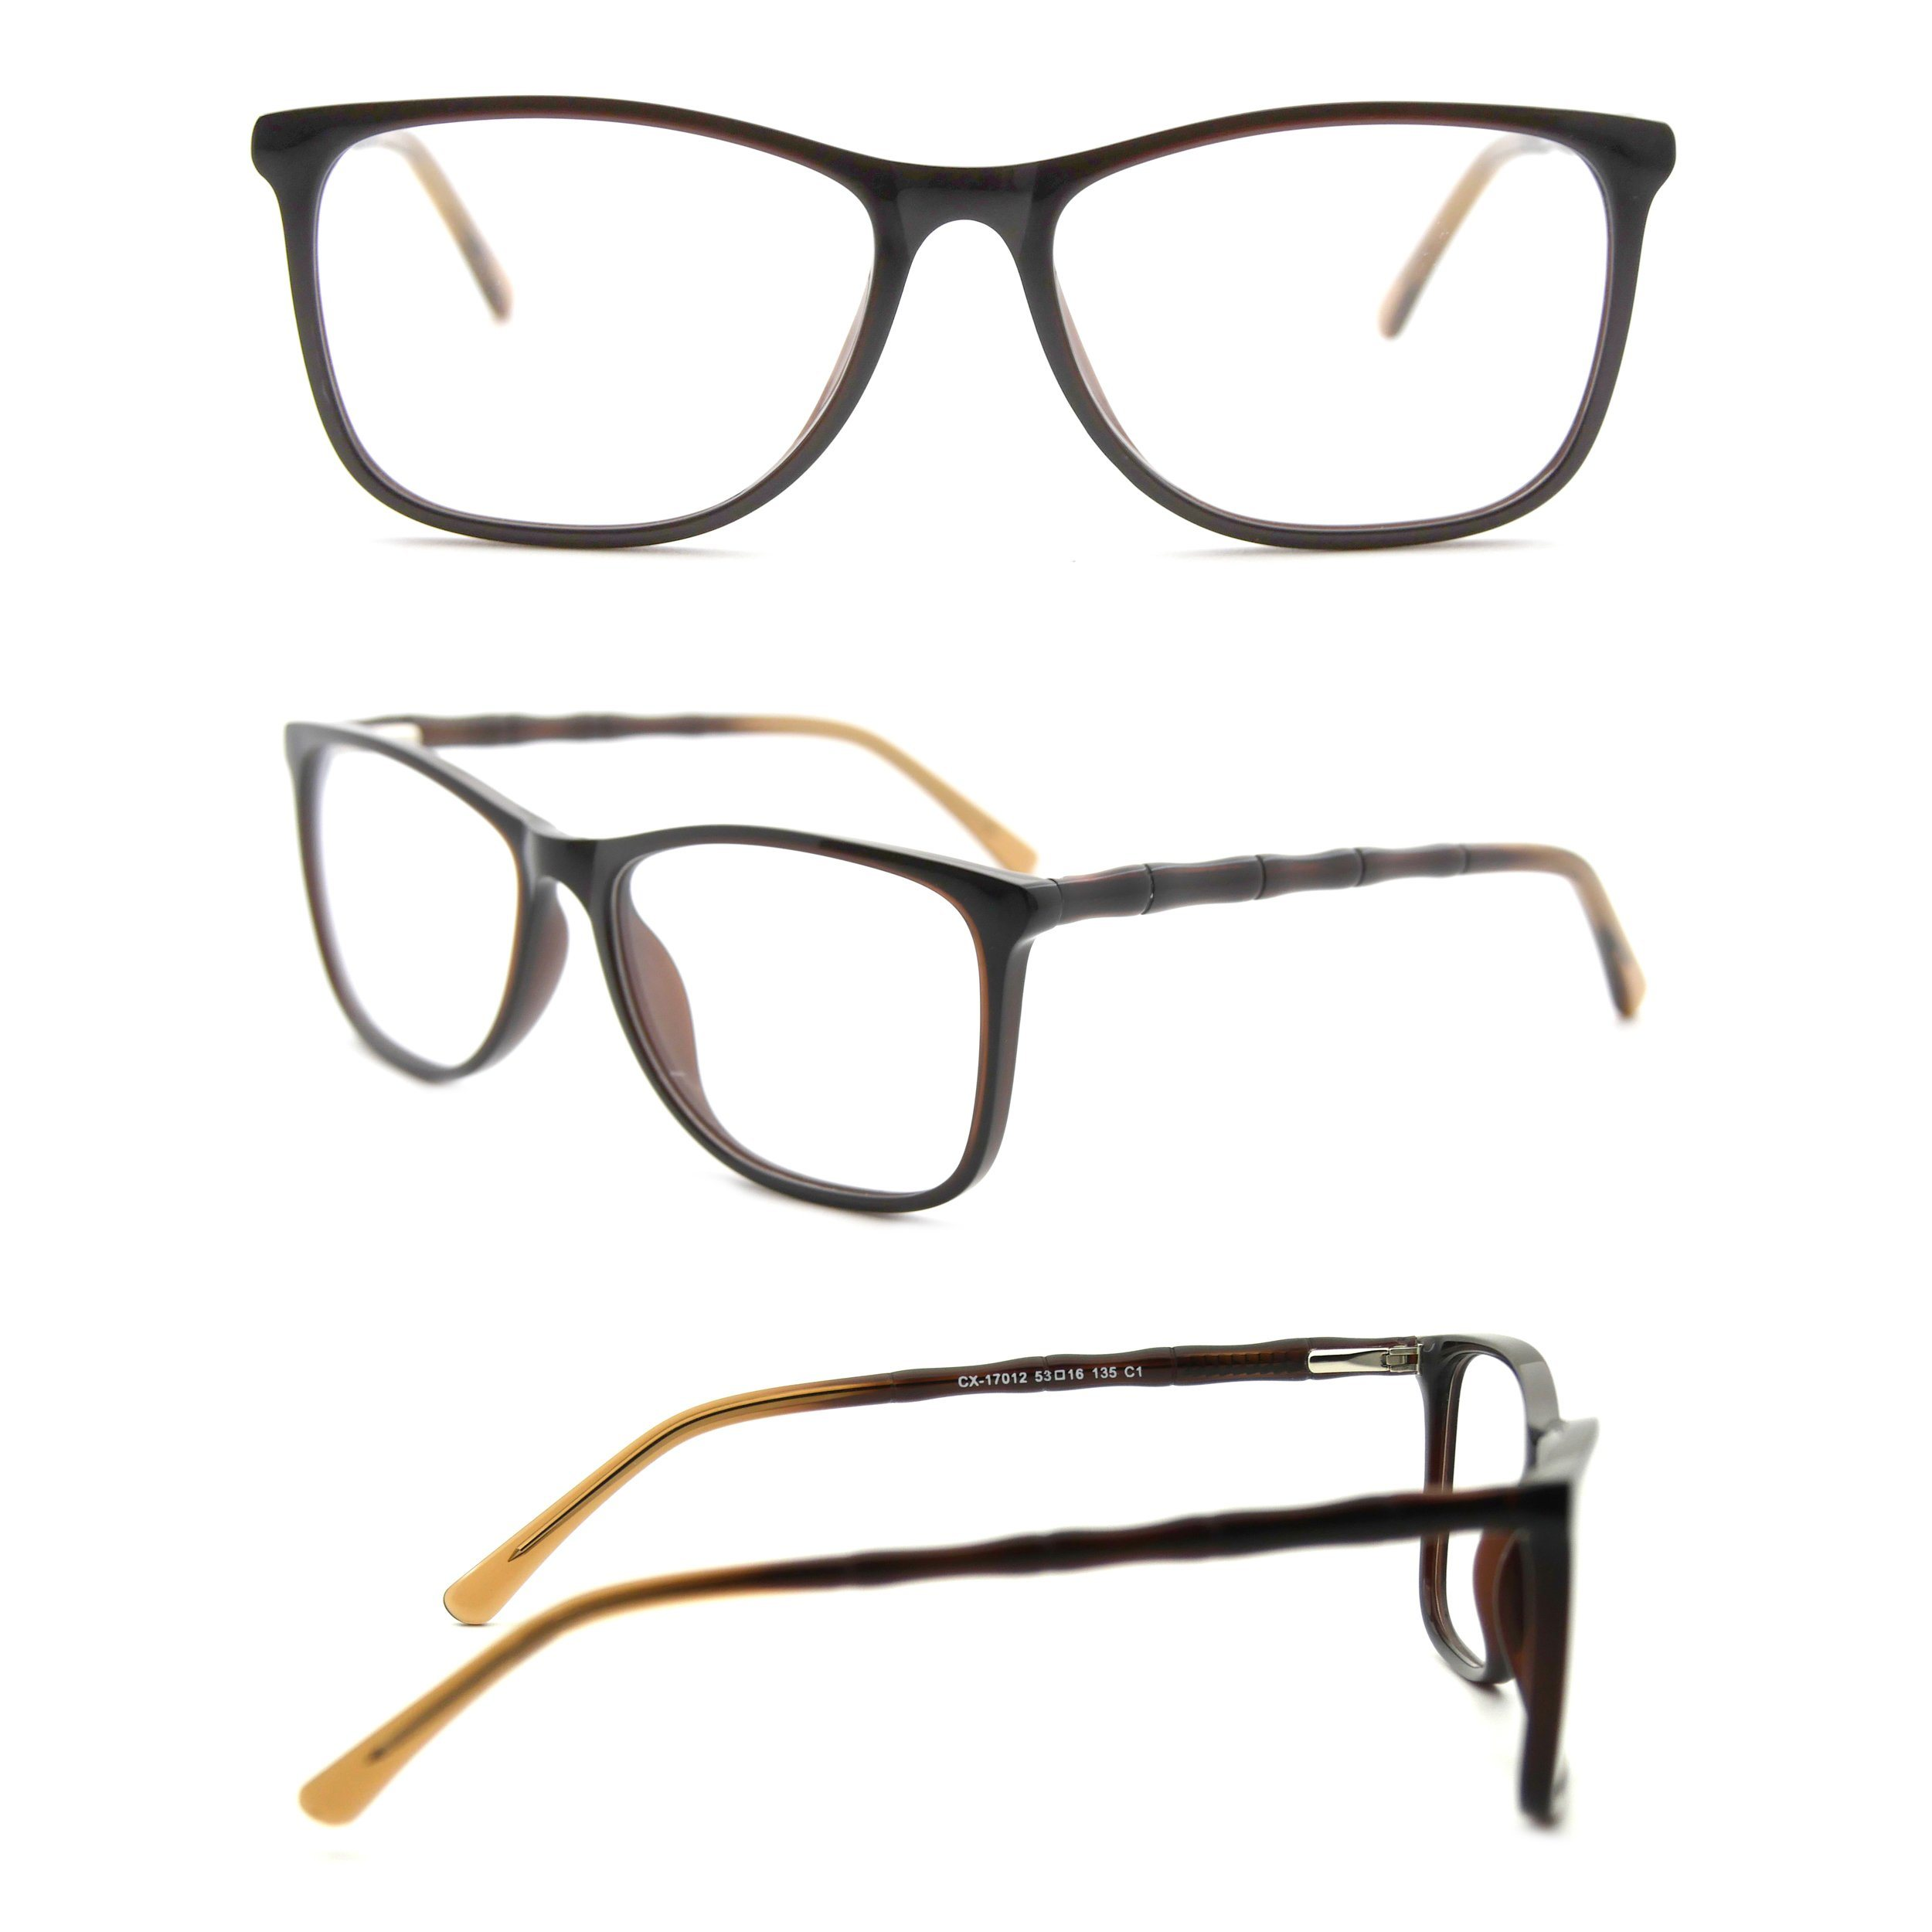 China Eyewear 2018 Fashion Acetate Optical Frame Models and High ...